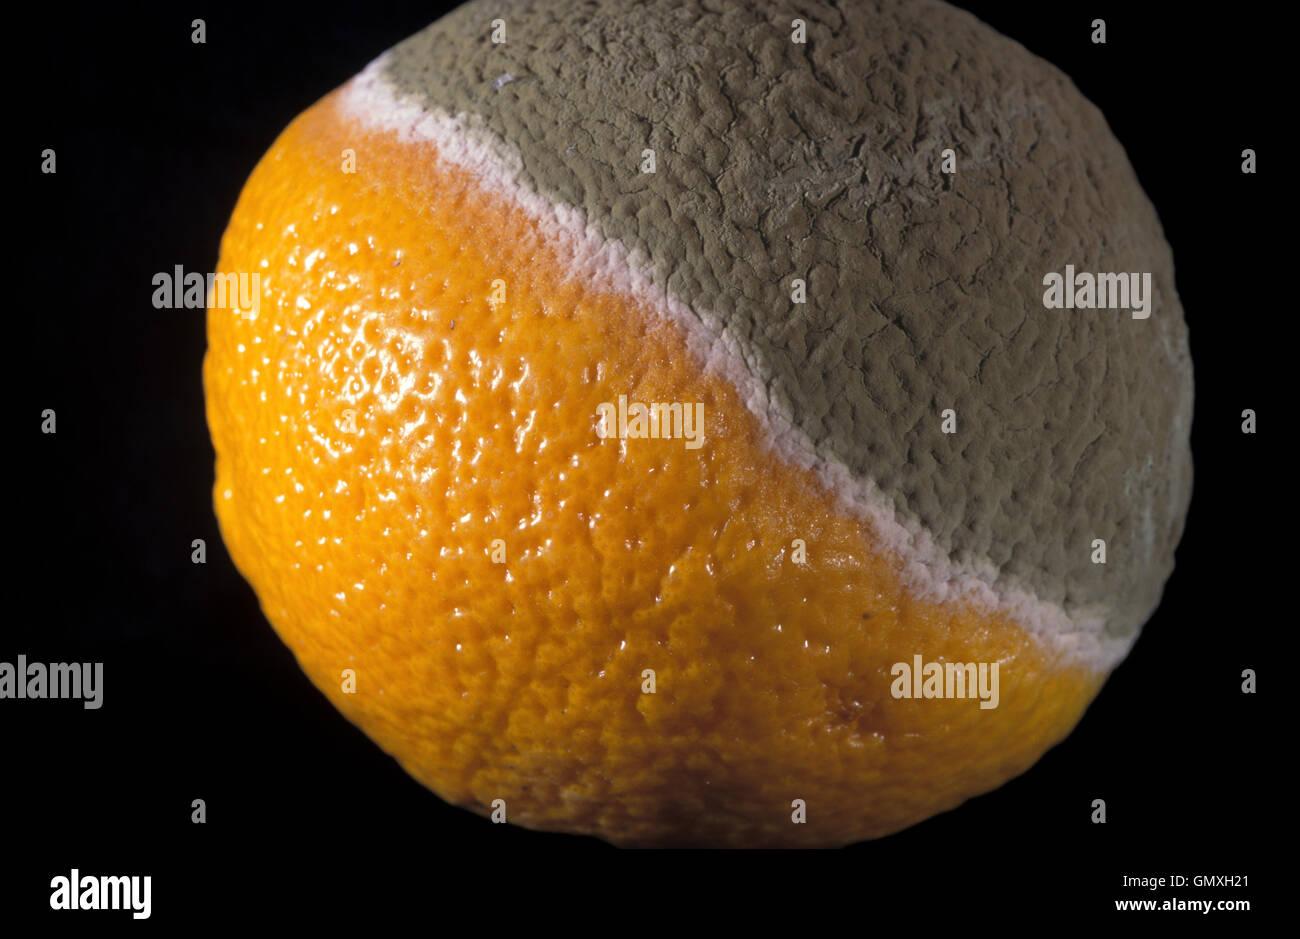 Half rotten orange with mold. Portugal - Stock Image